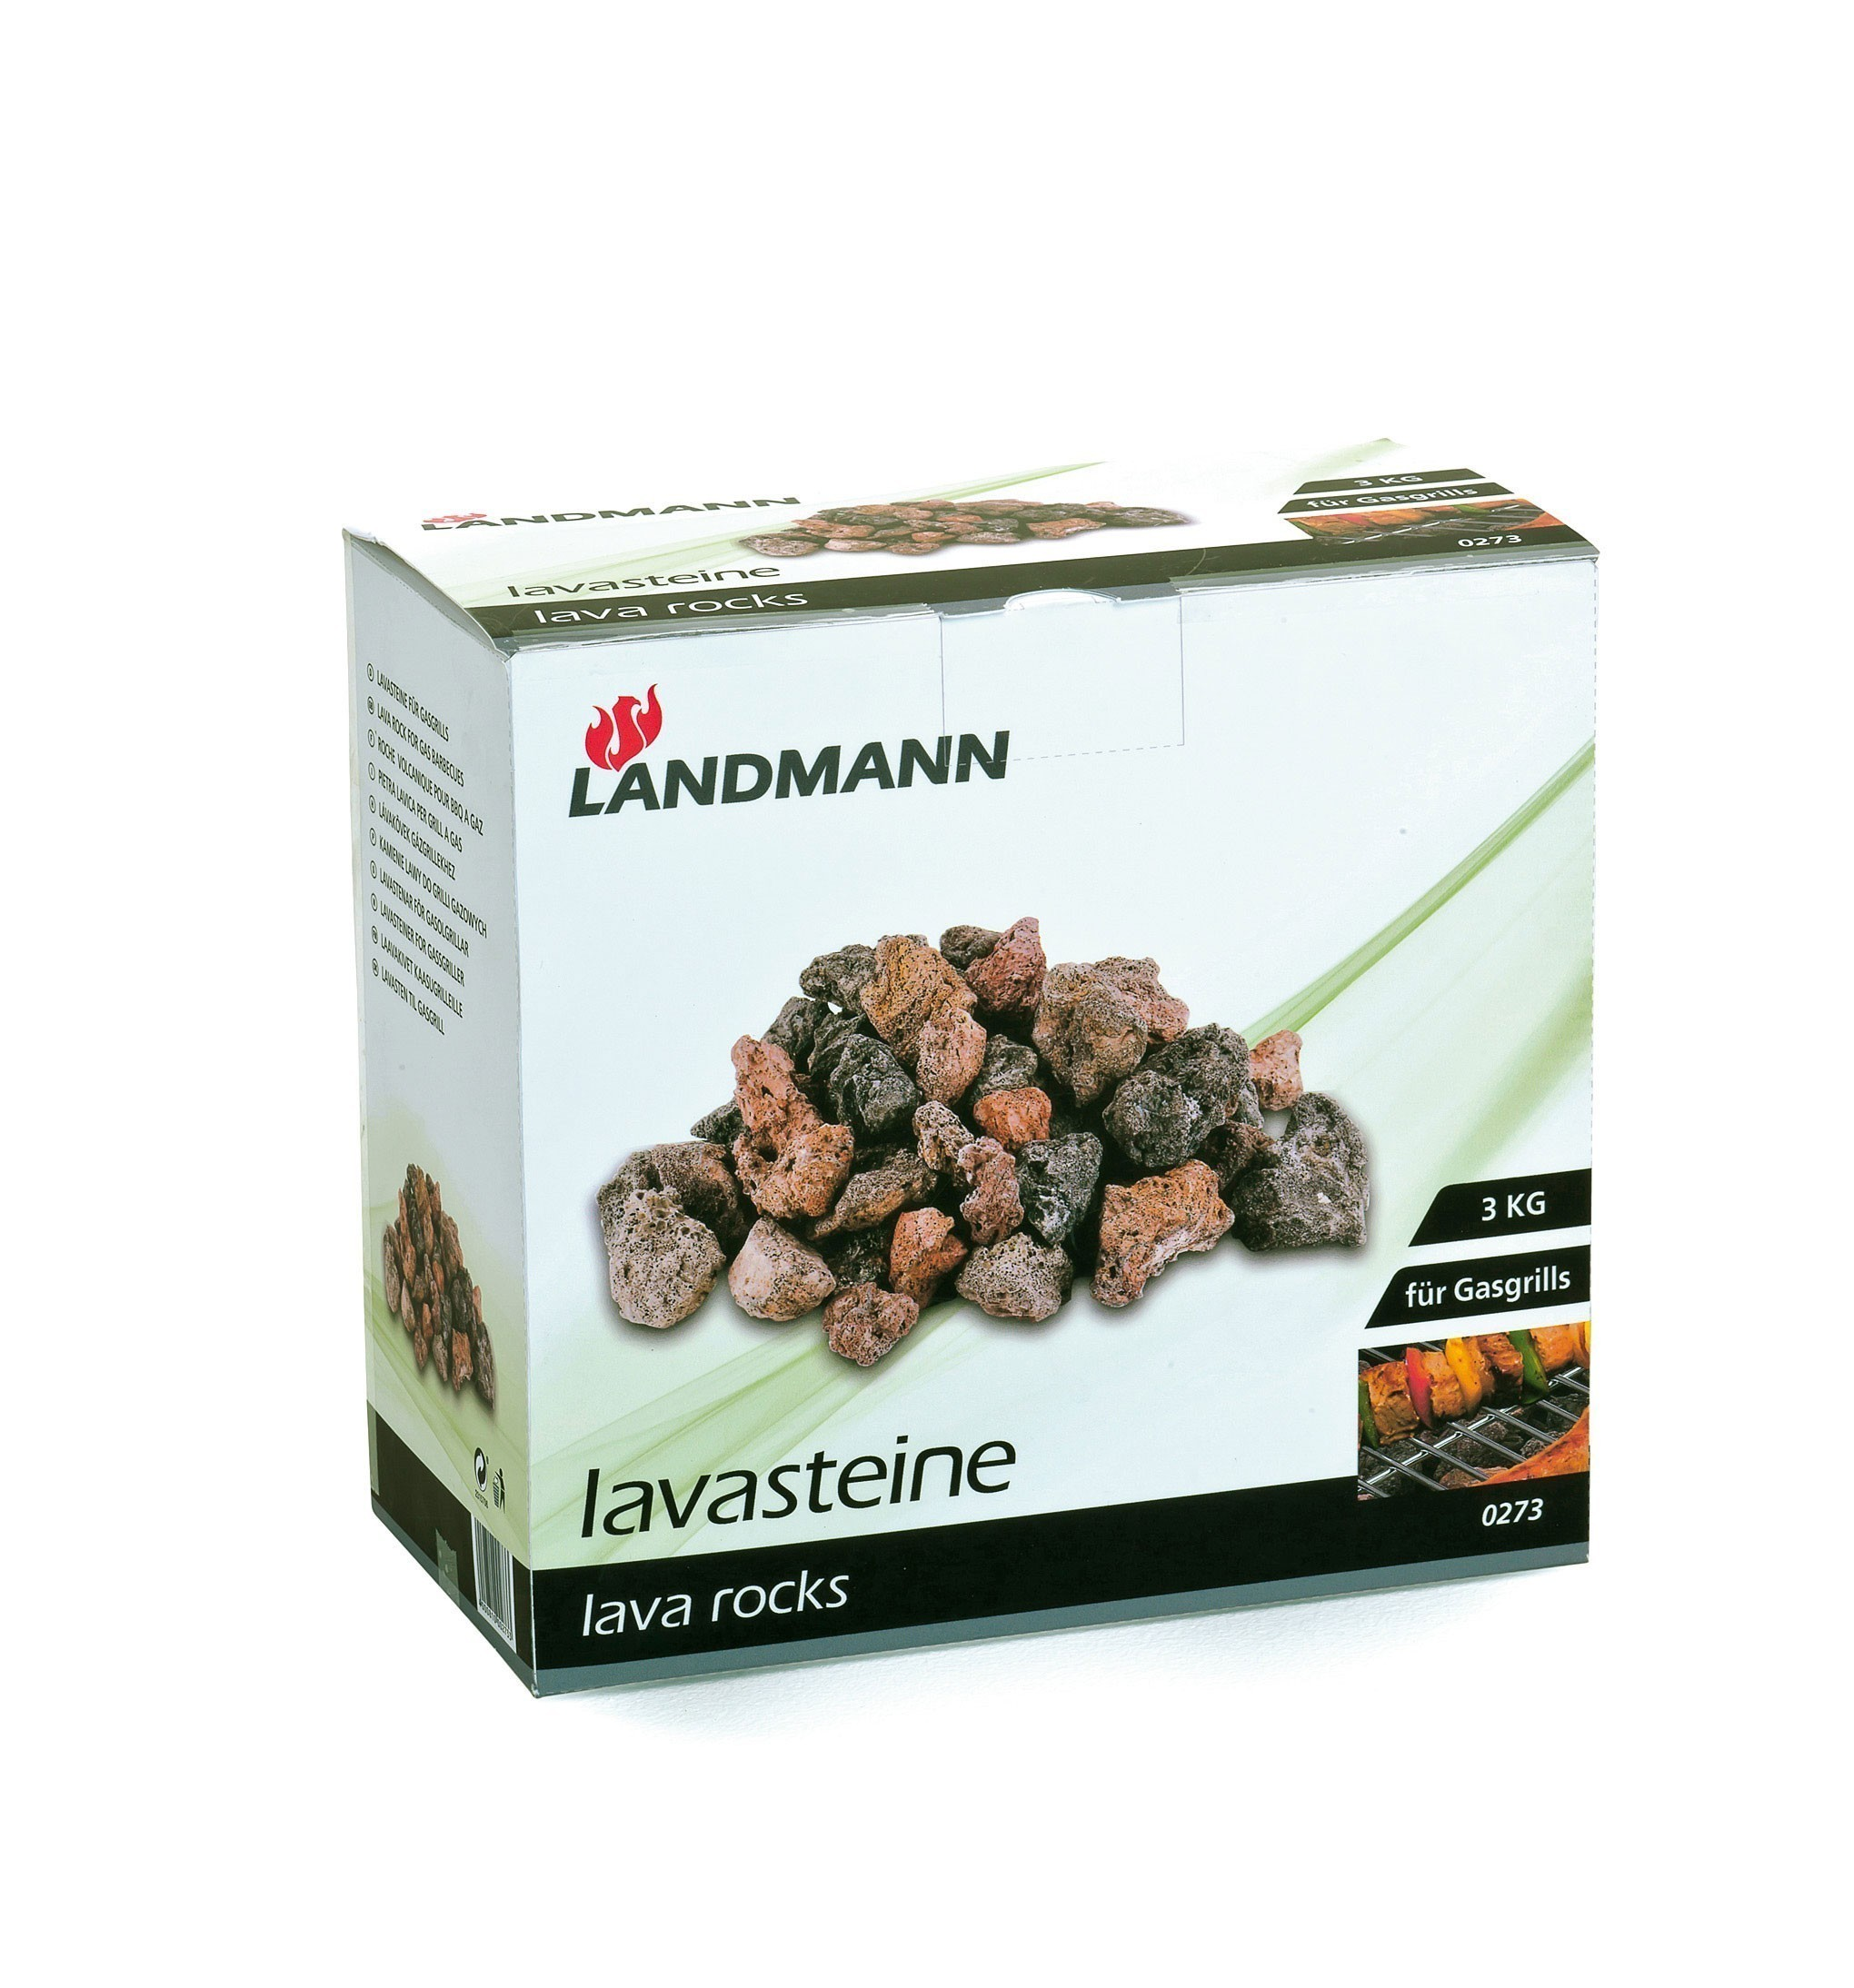 landmann lavastein f r gasgrill 3 kg 0273 bei. Black Bedroom Furniture Sets. Home Design Ideas